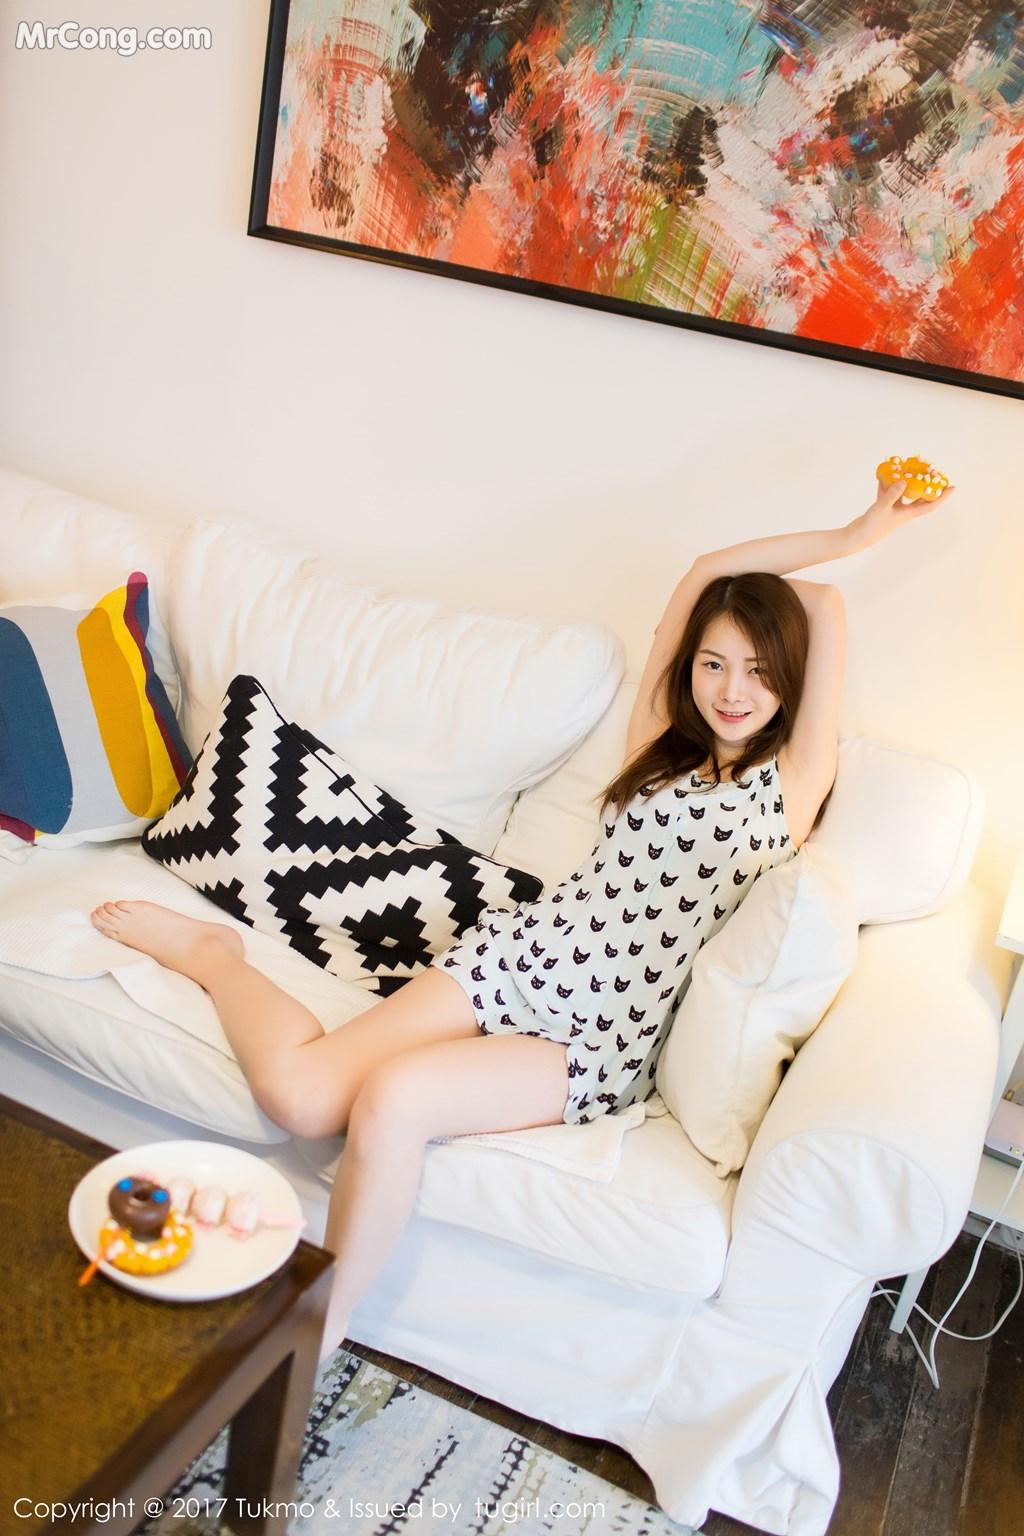 Image Tukmo-Vol.101-Mian-Mian-MrCong.com-006 in post Tukmo Vol.101: Người mẫu Mian Mian (绵绵) (45 ảnh)